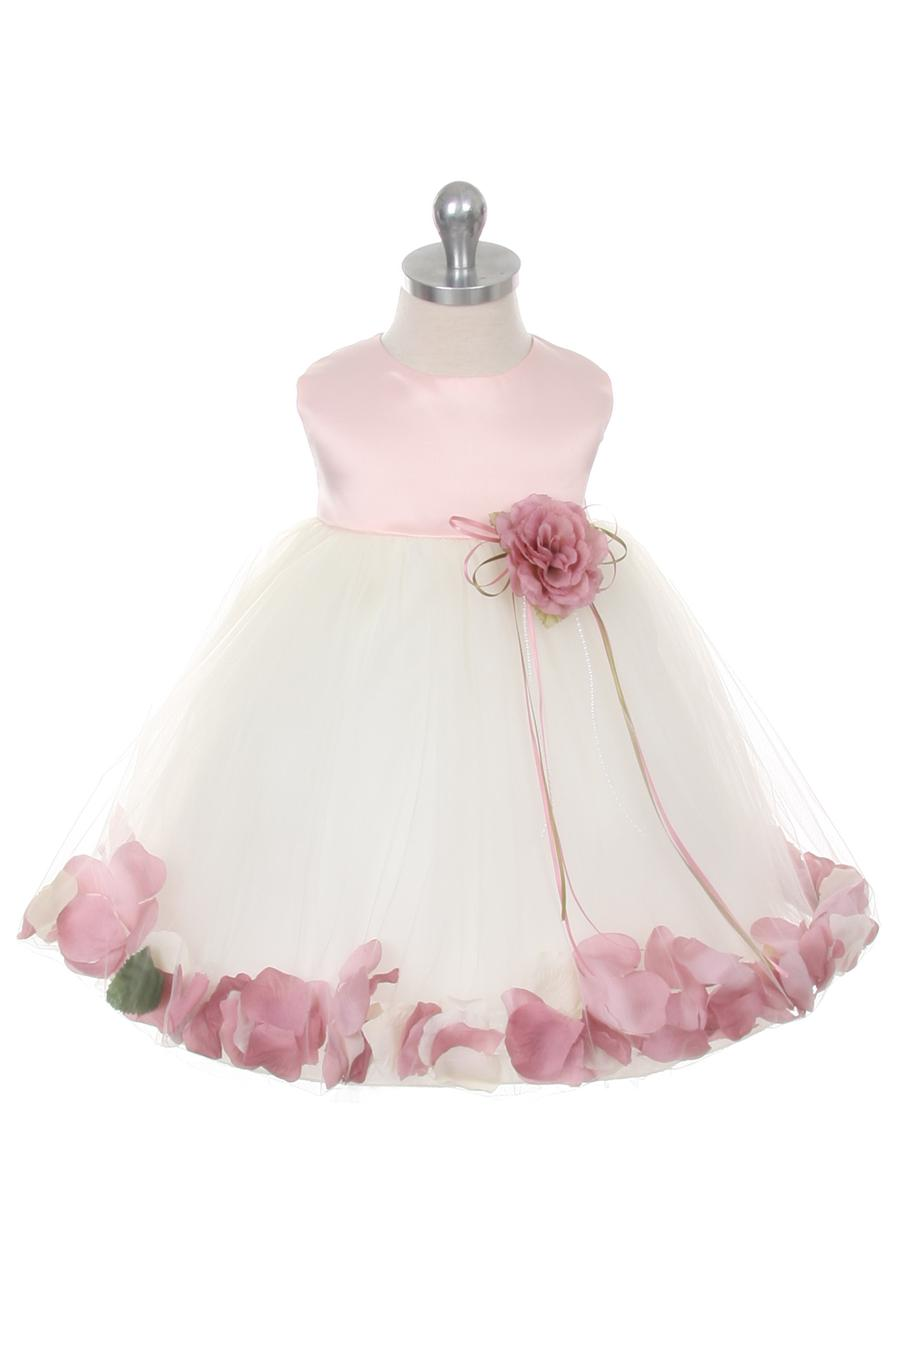 Petal Dress Baby No Sash To Customize Grandma s Little